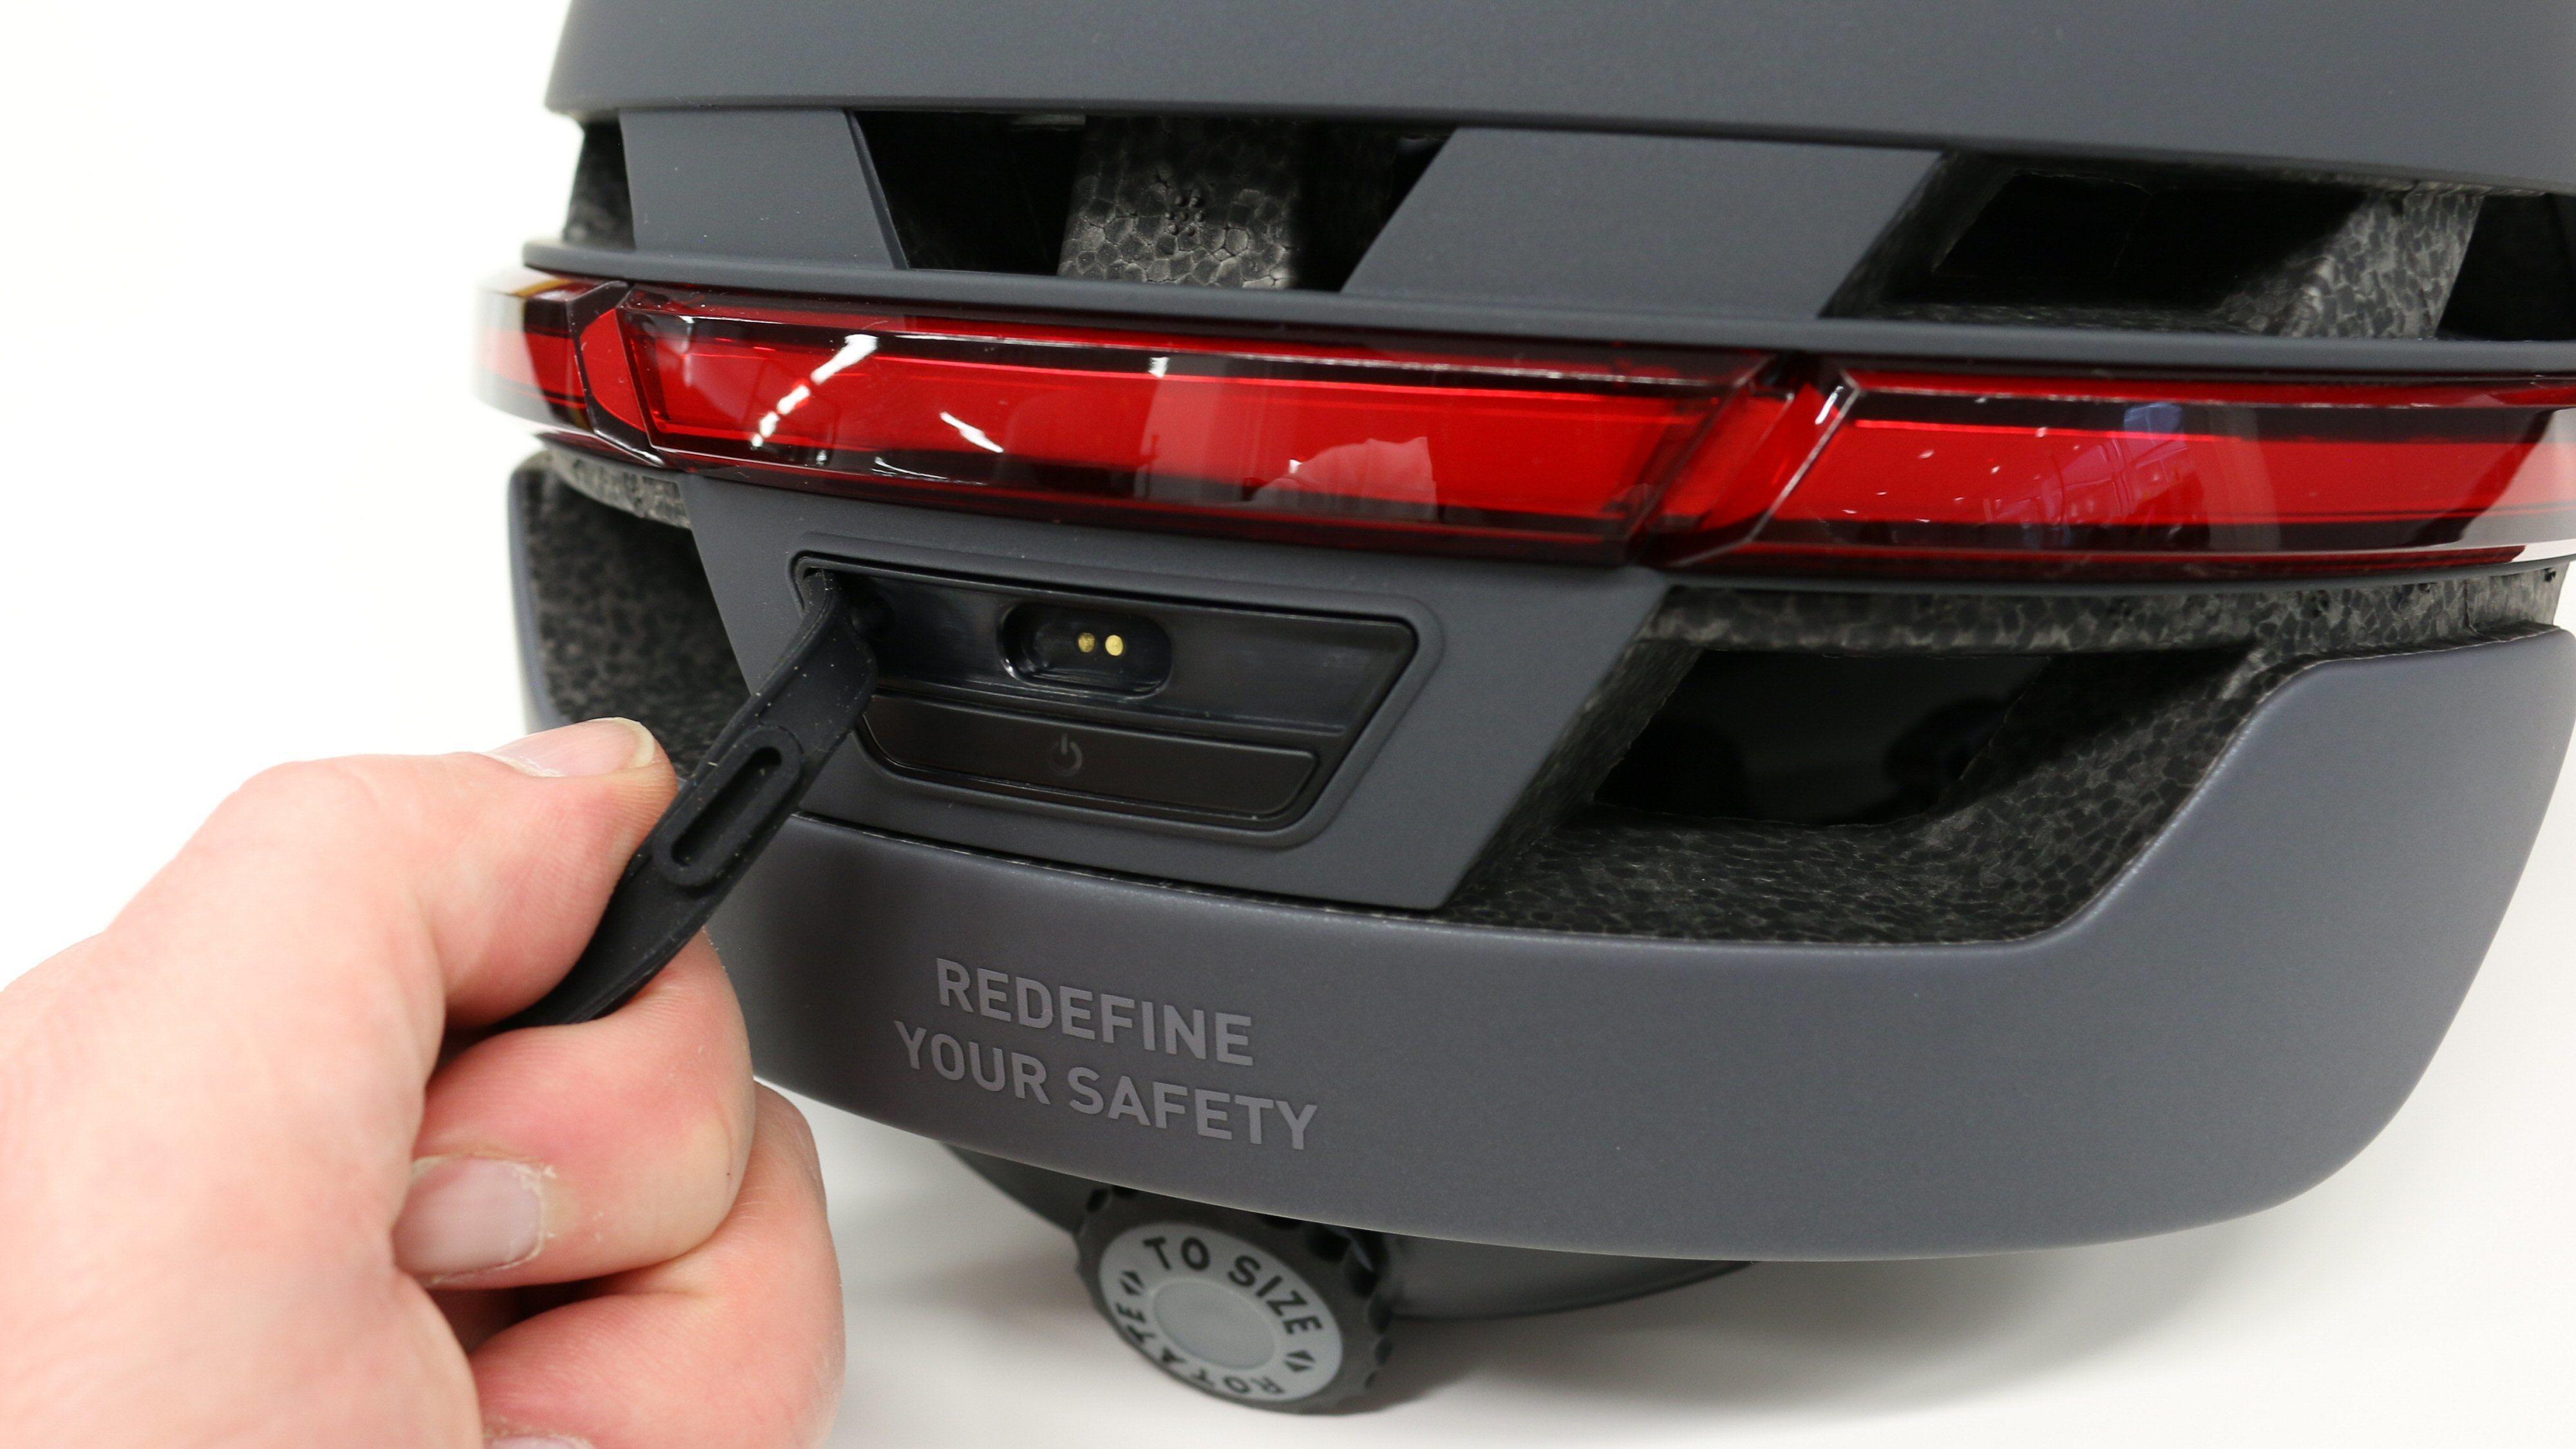 Hjelmen lades over USB, men kontakten er proprietær.